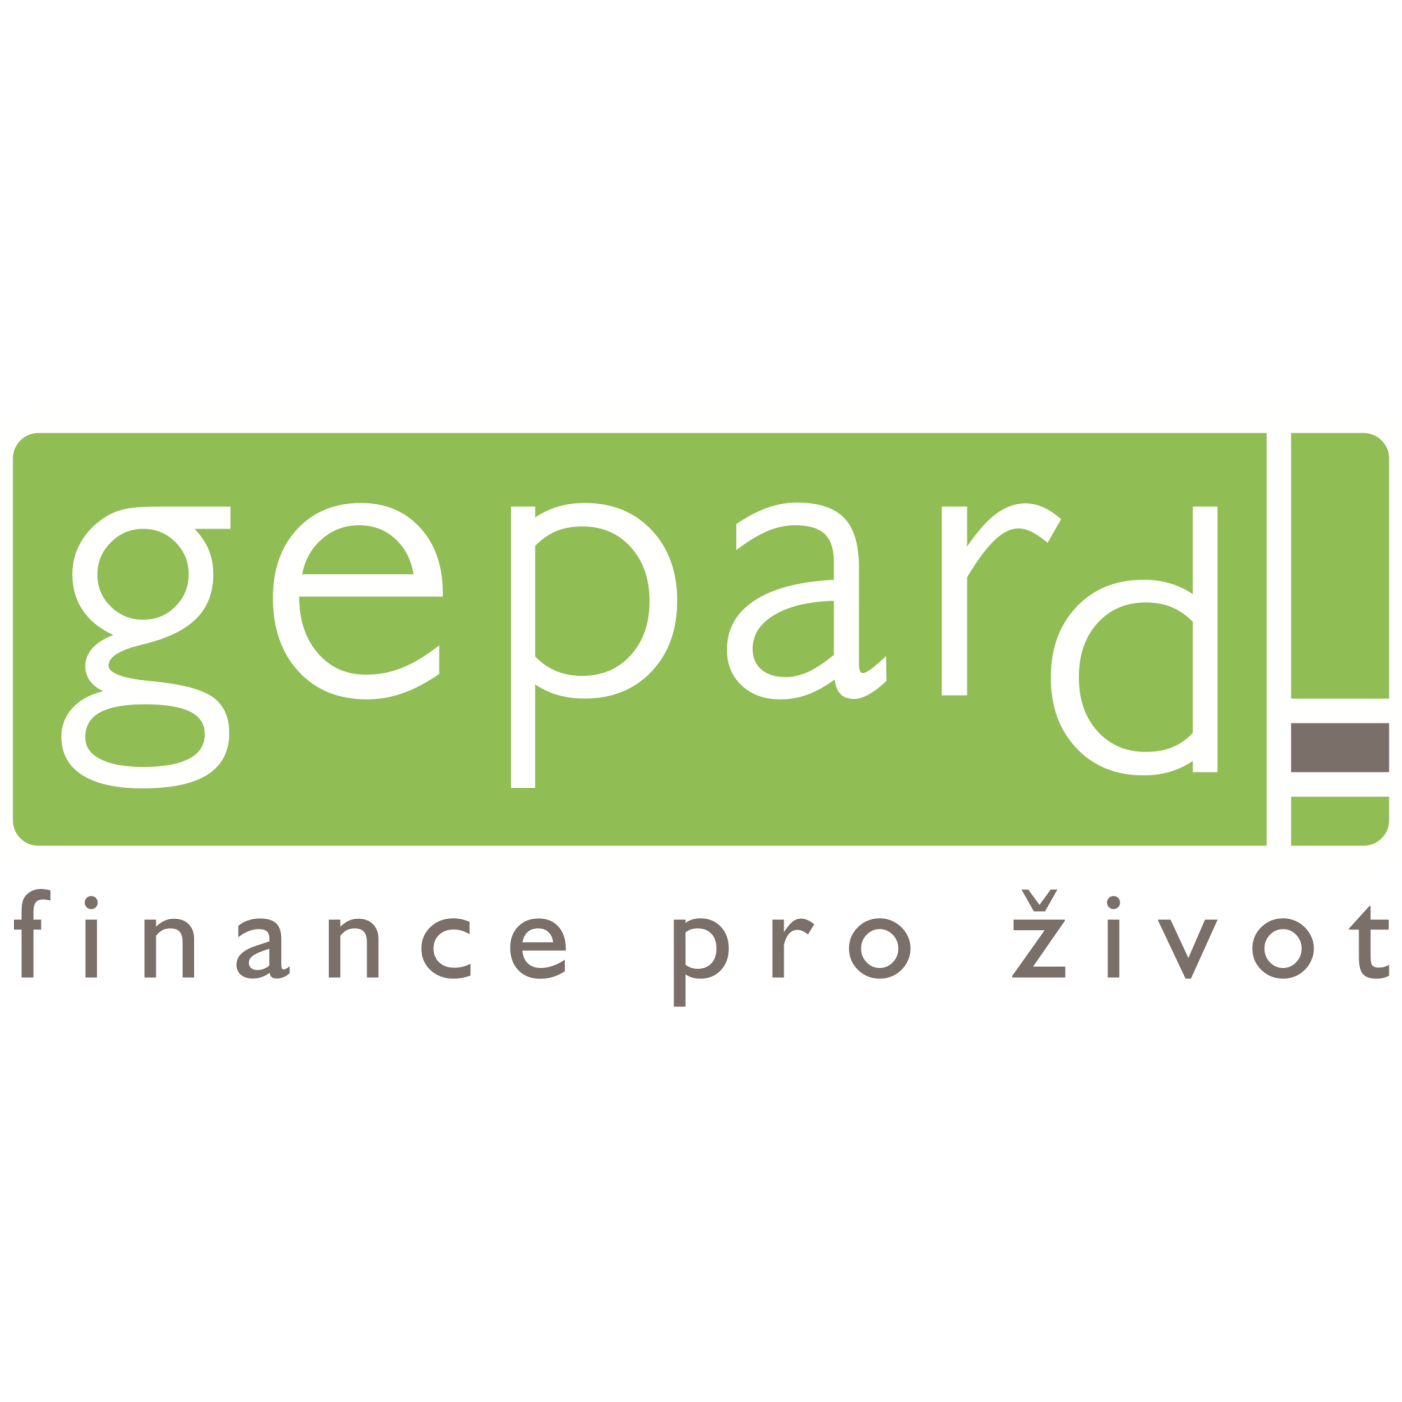 gepardfinance